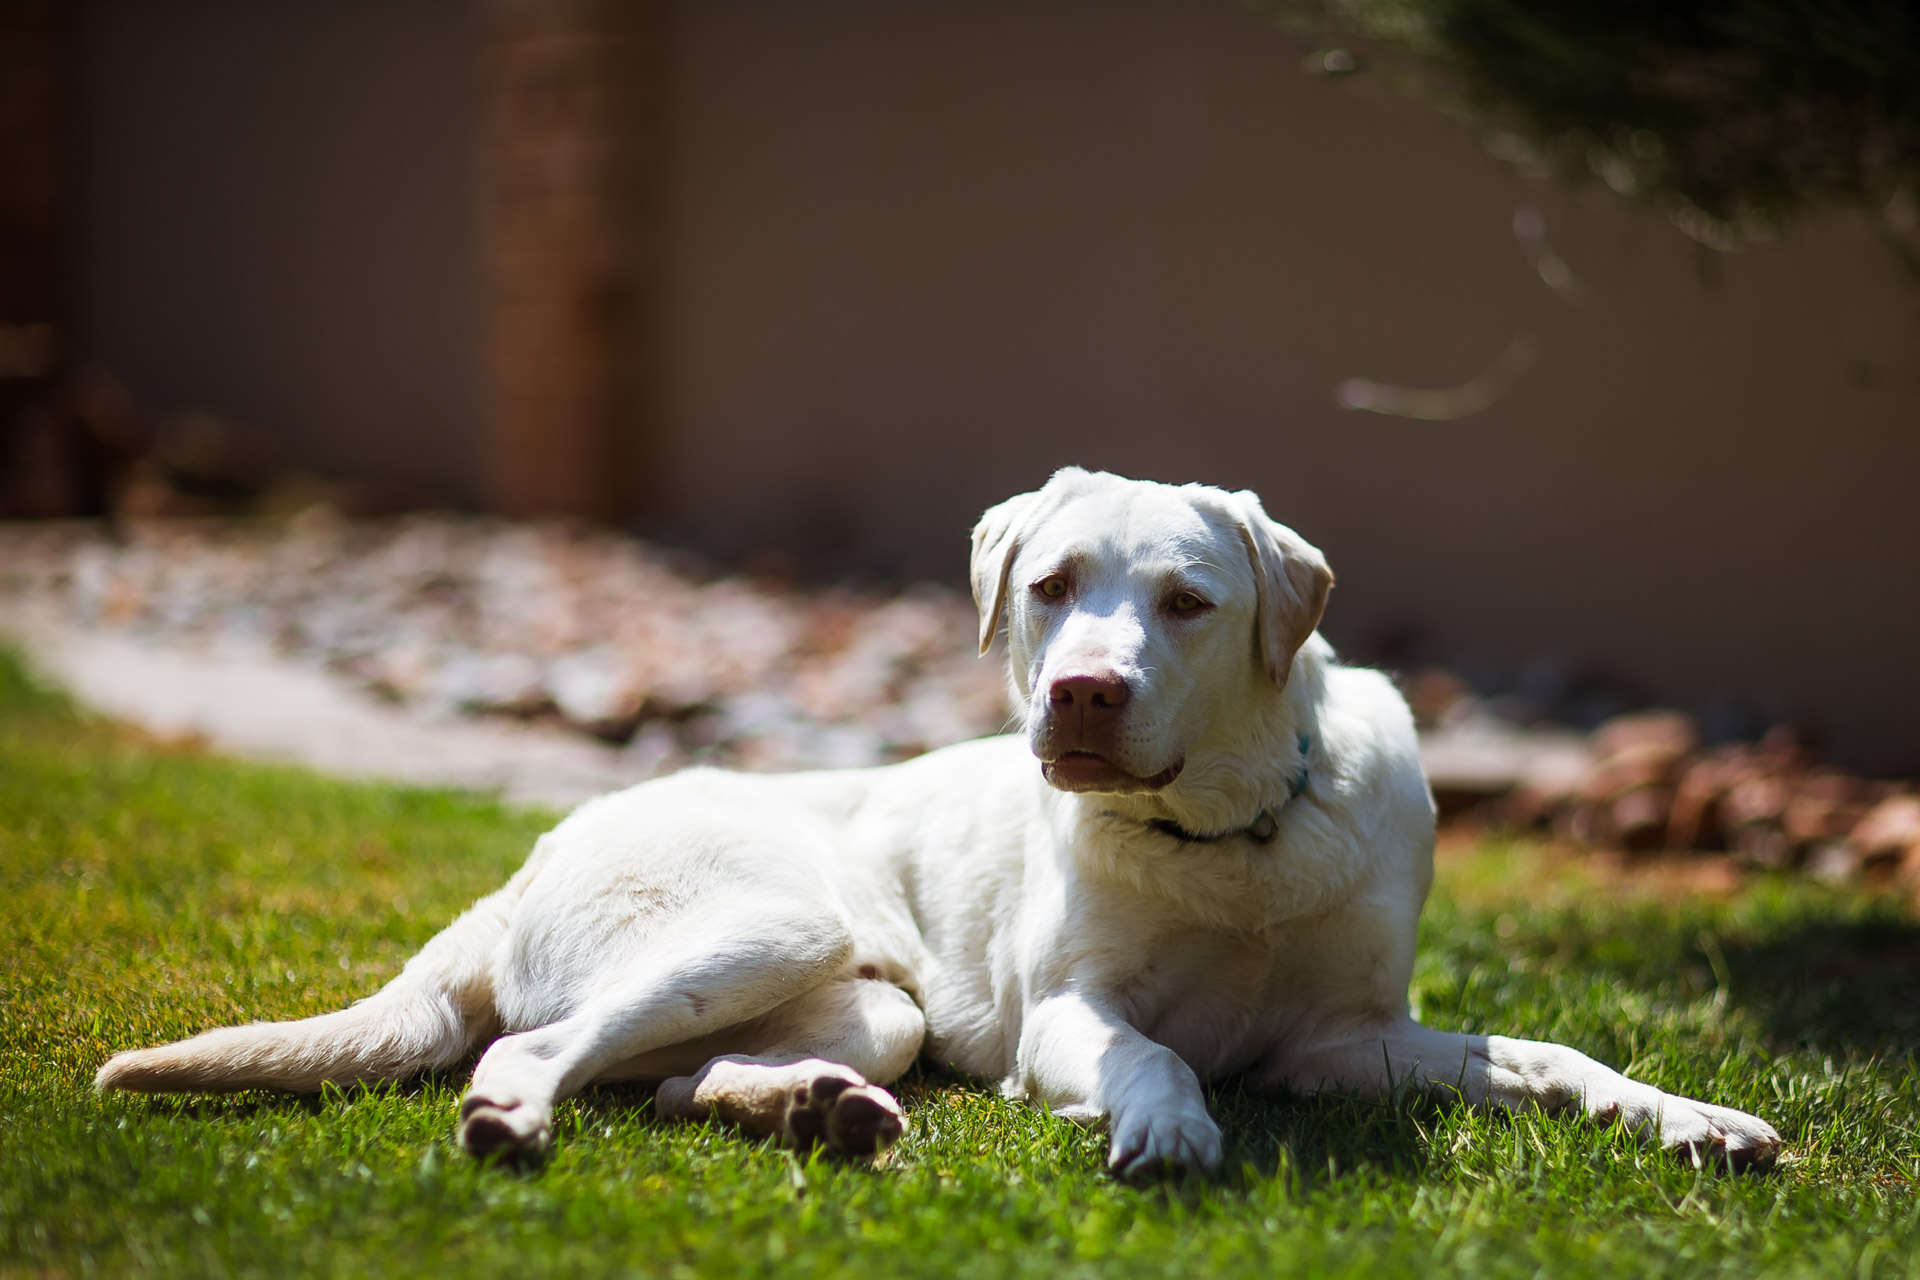 We got a dog – Choccy / Chewbacca